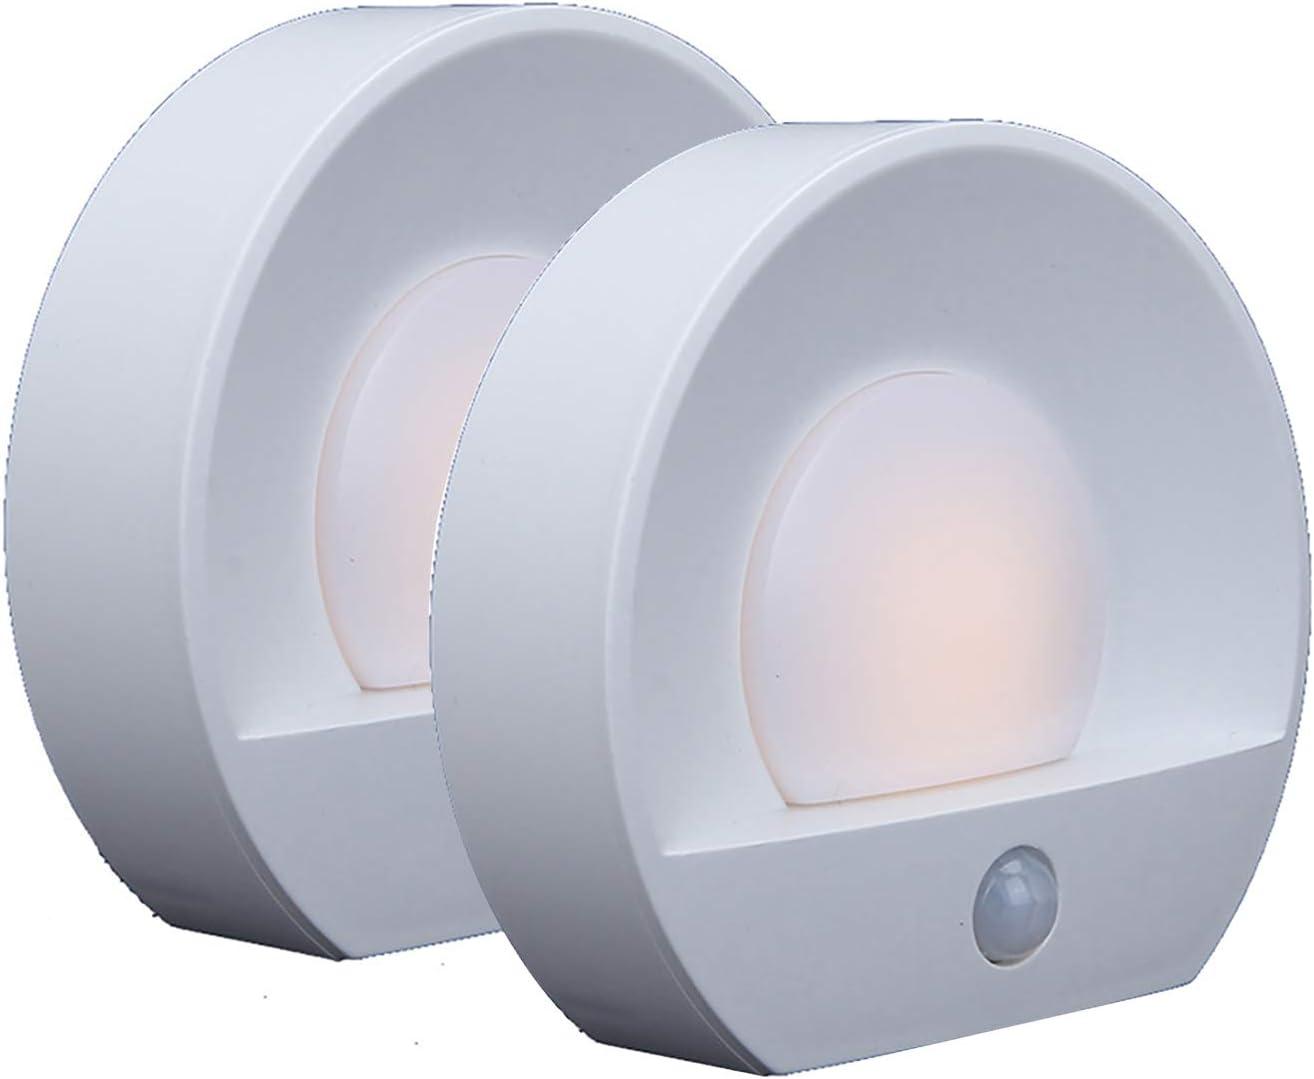 ZXCVASDF Sensor Nashville-Davidson 5% OFF Mall Light Closet Portable Night B LED